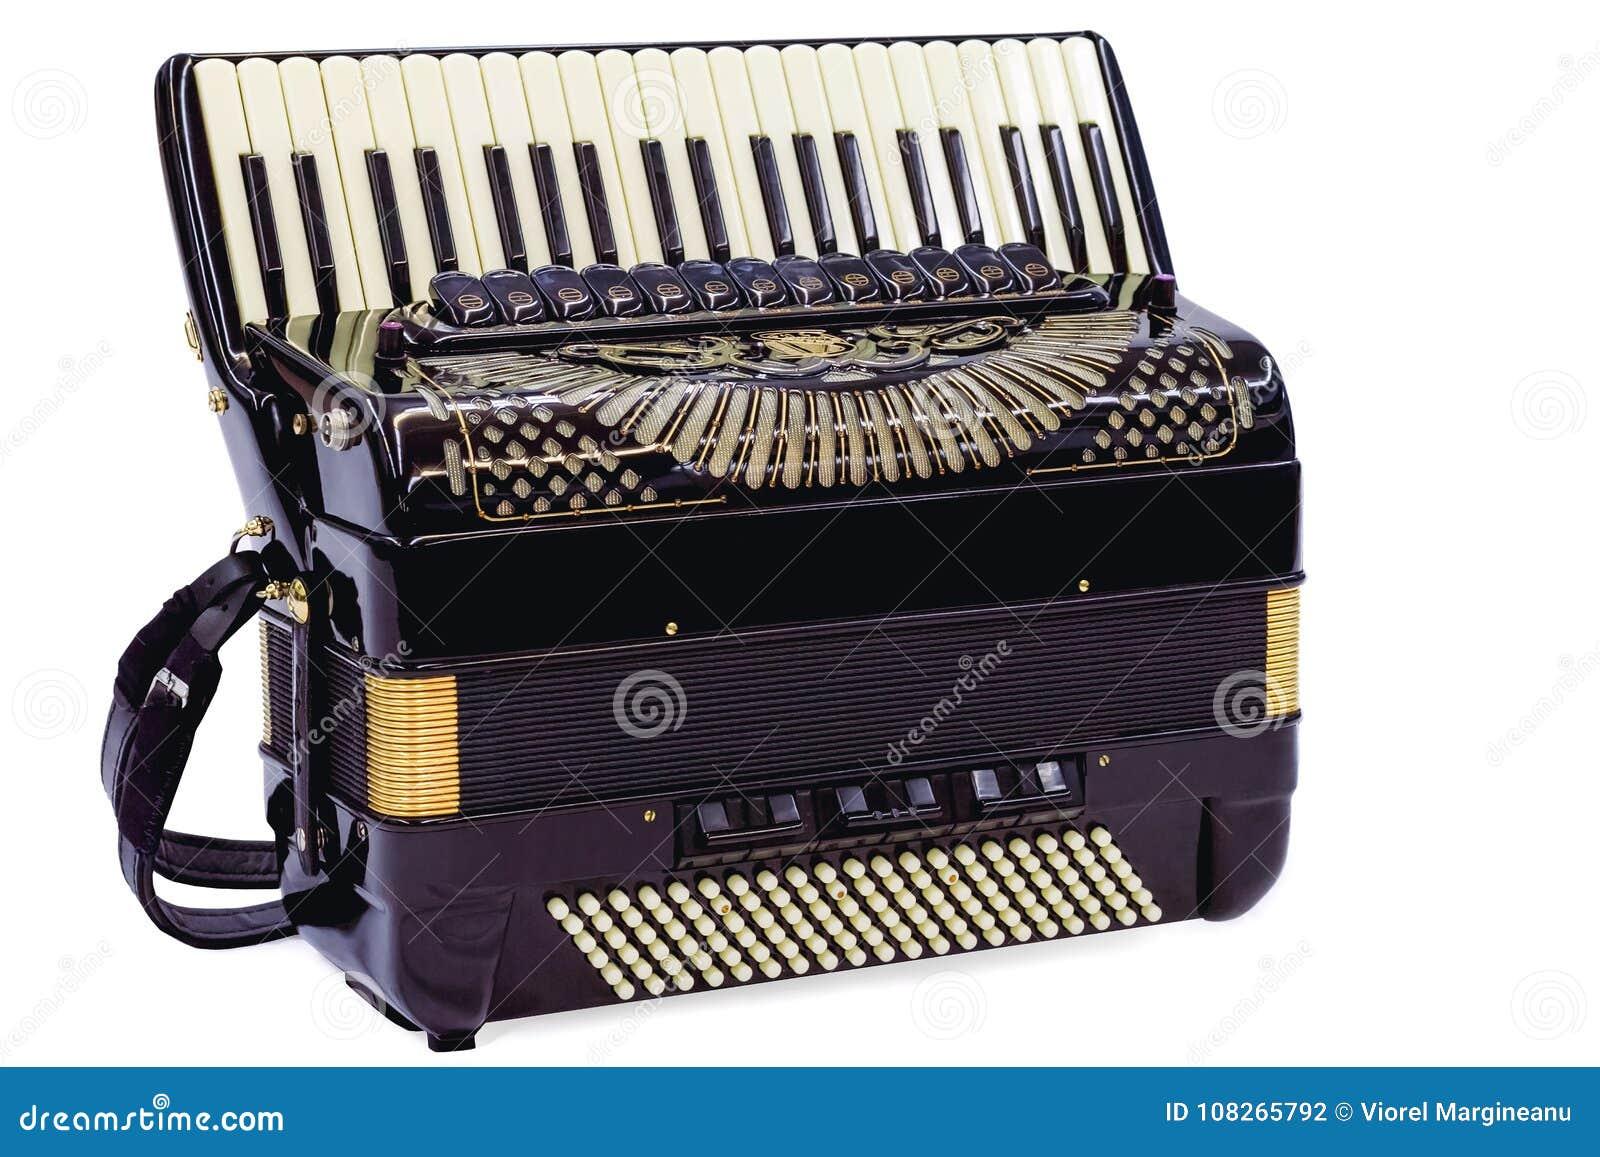 Harmonika in wit